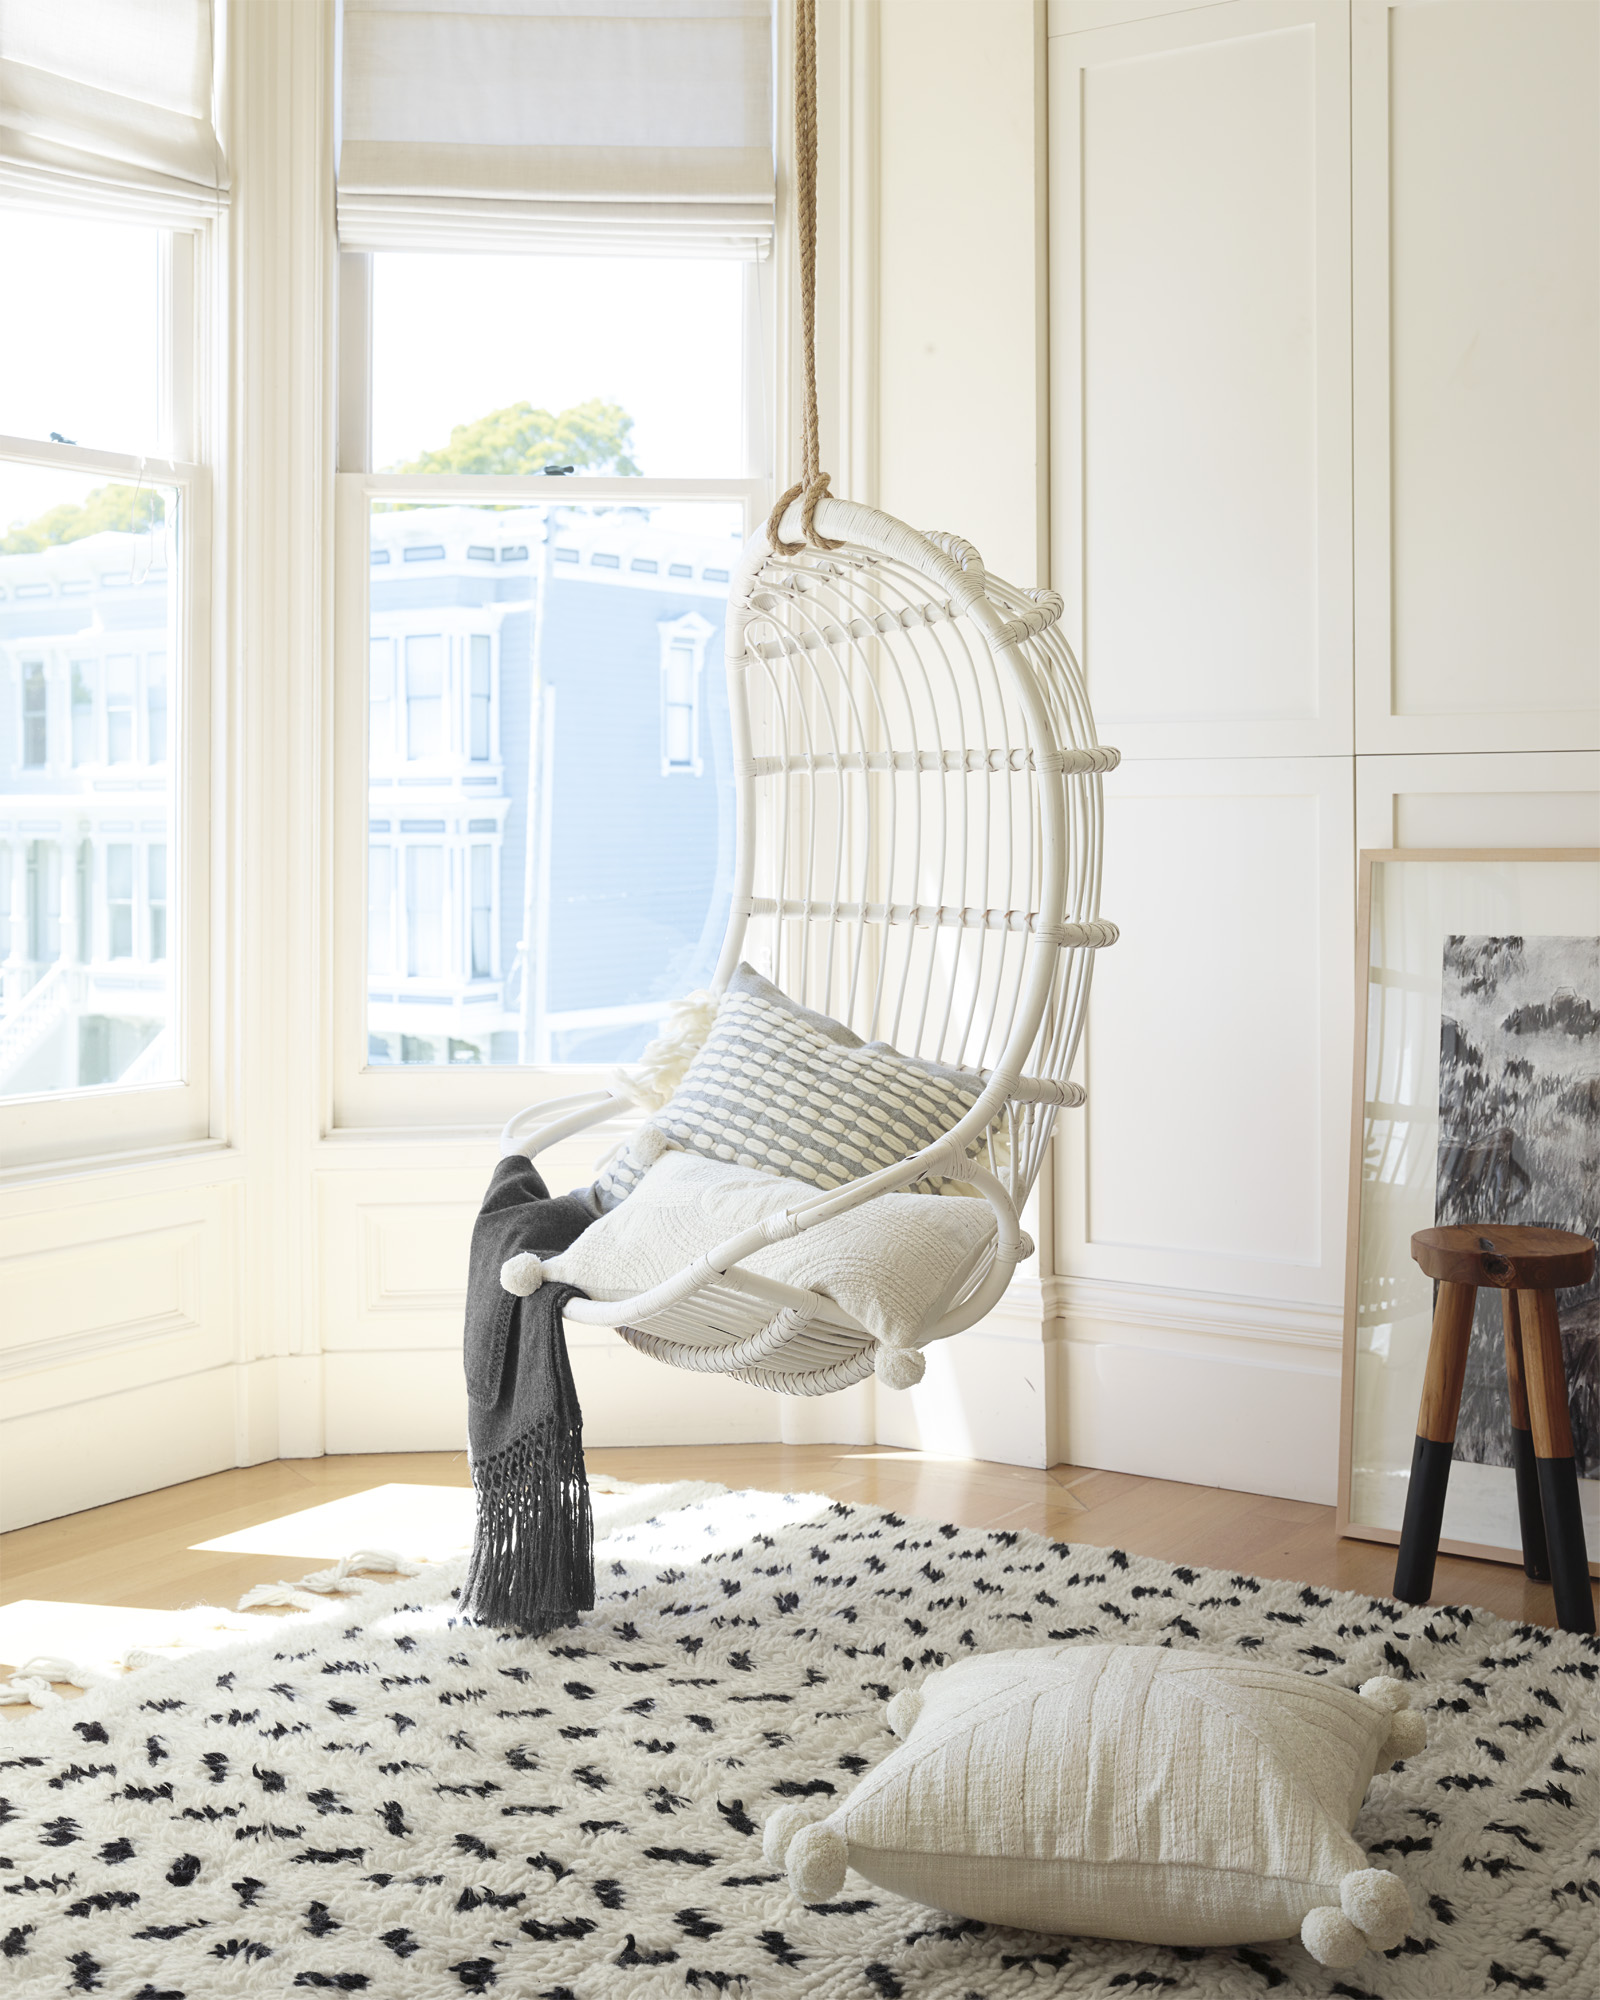 Chair_Hanging_RDH-80906-brighter_Crop_BASE.jpg